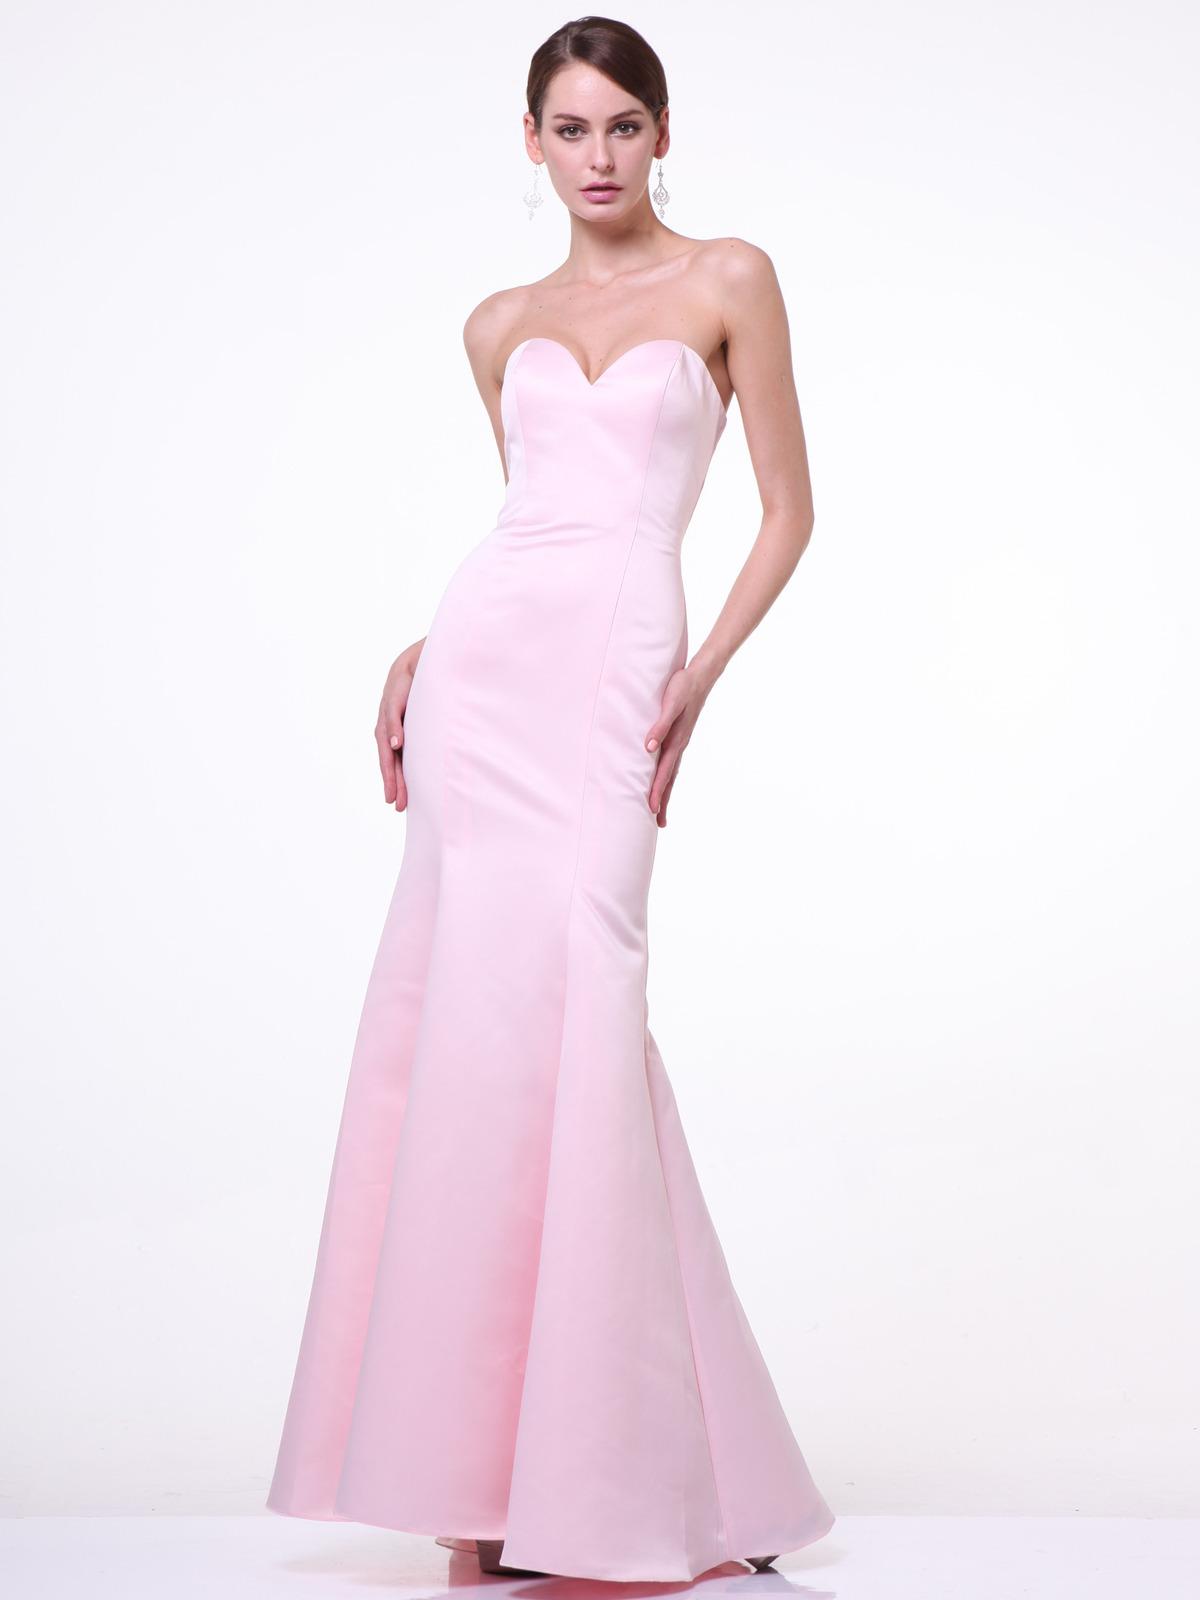 Sweetheart Dresses